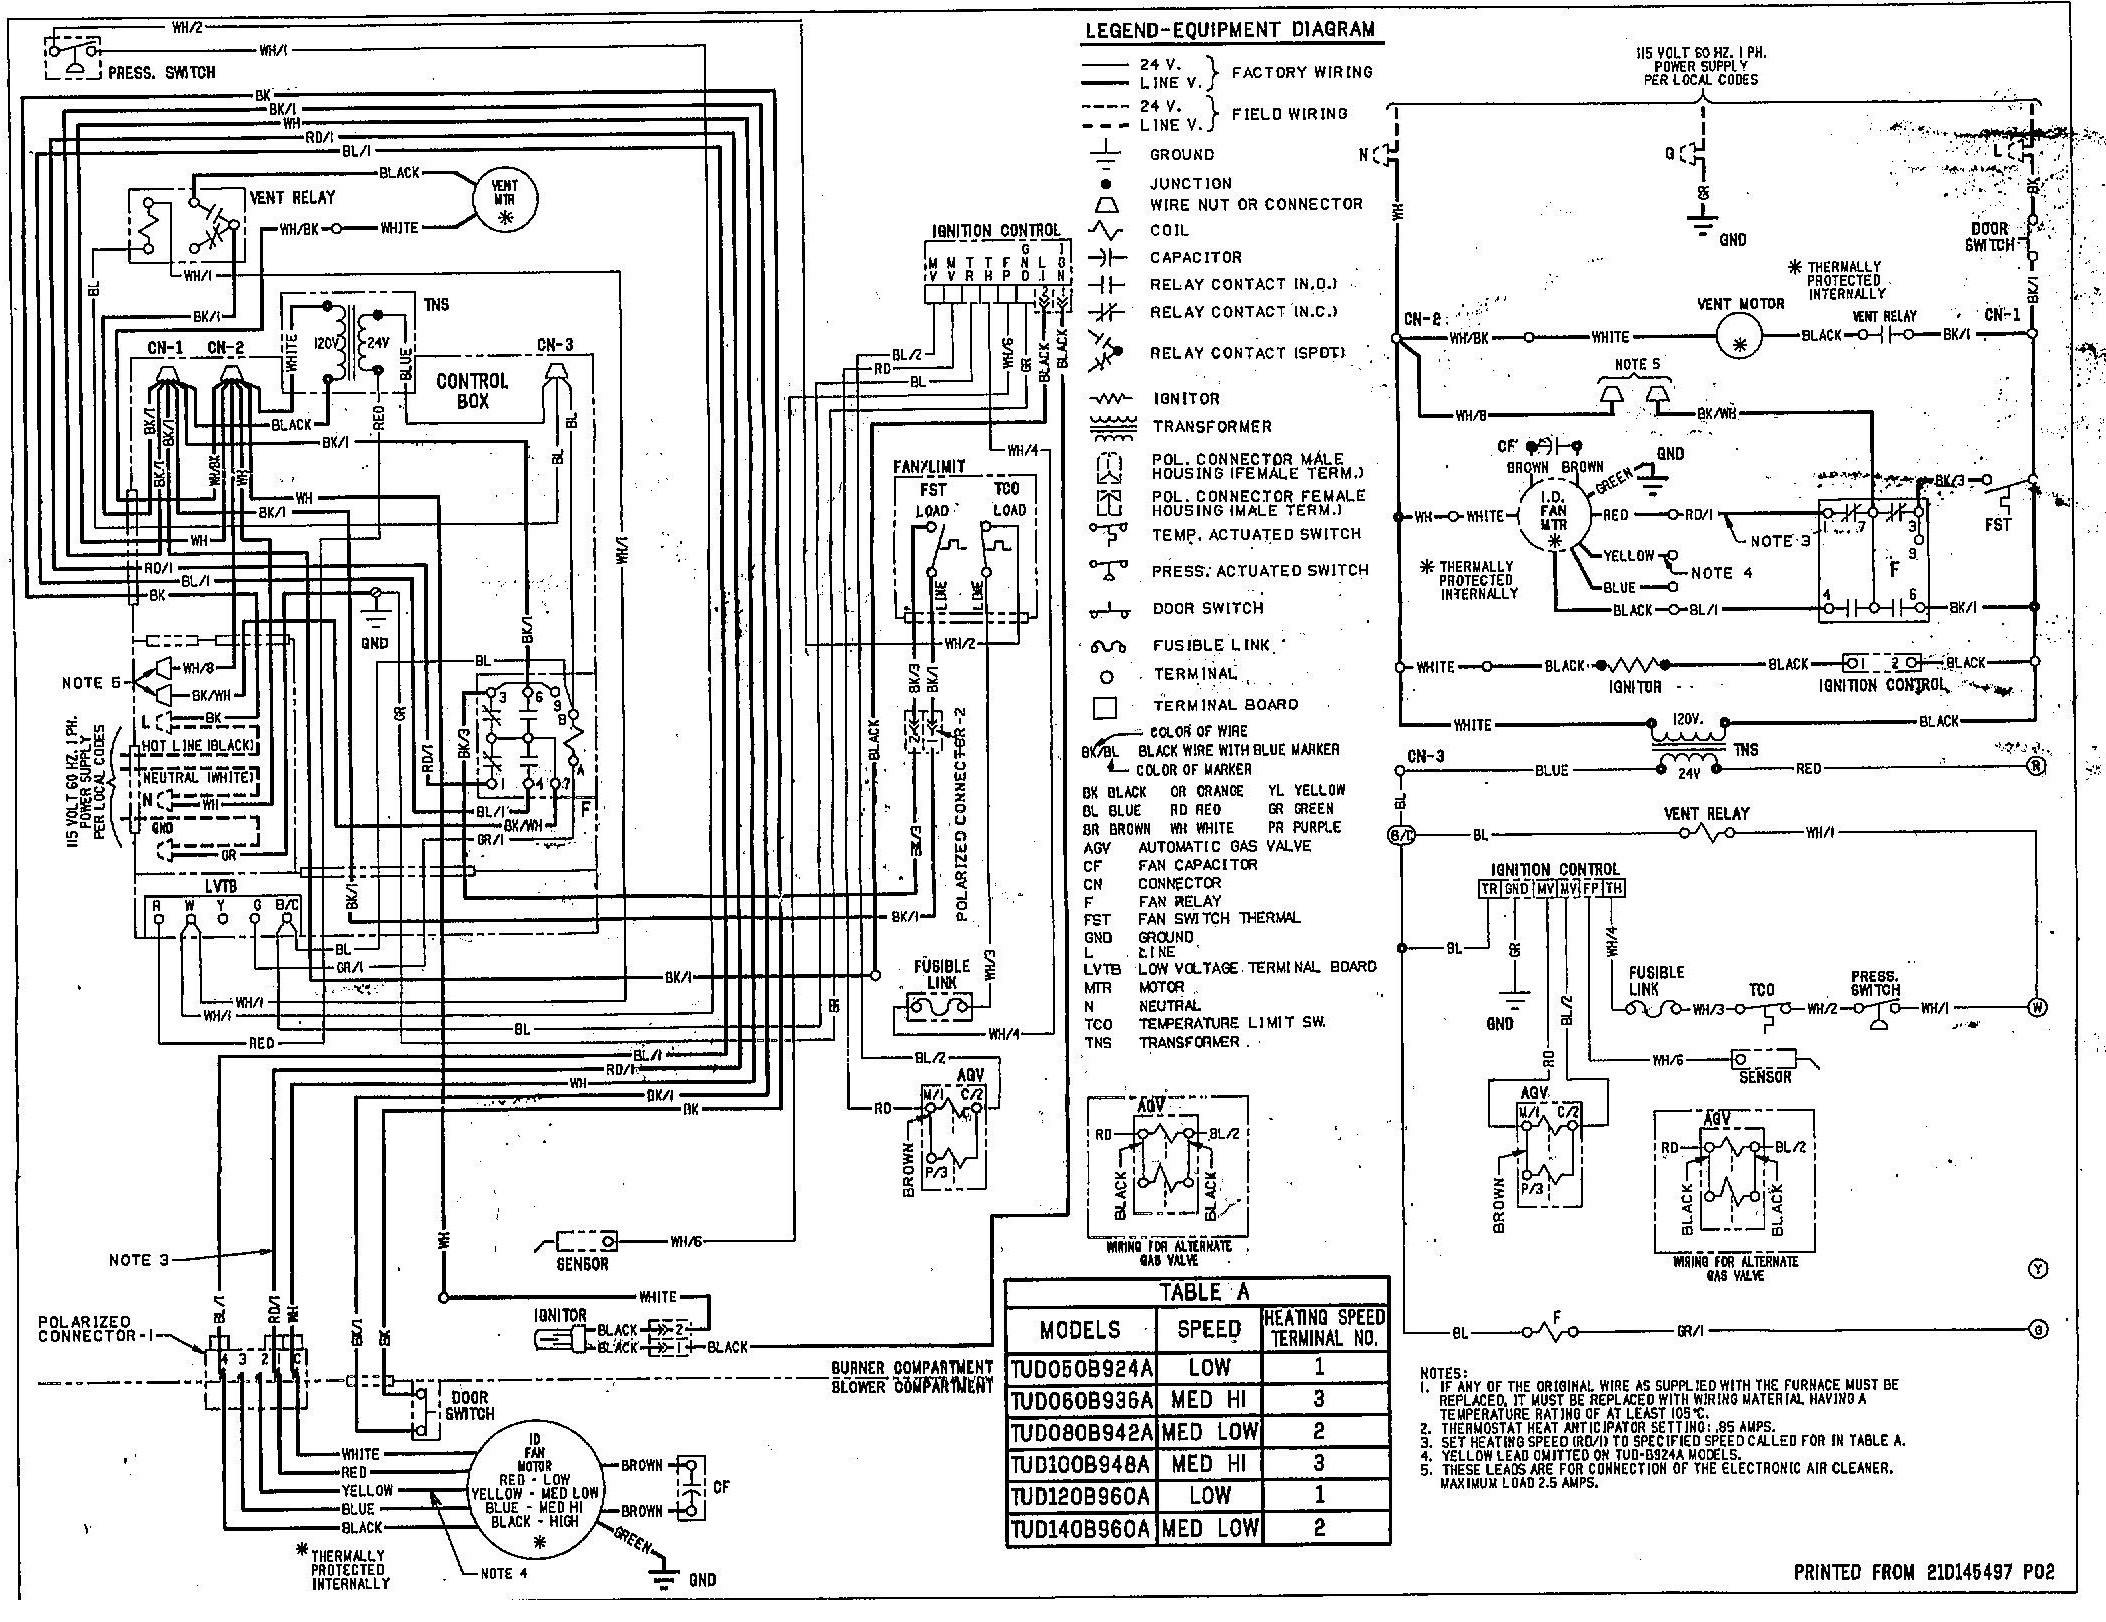 janitrol furnace thermostat wiring diagram pediatric ekg lead placement reznor heater gallery | sample